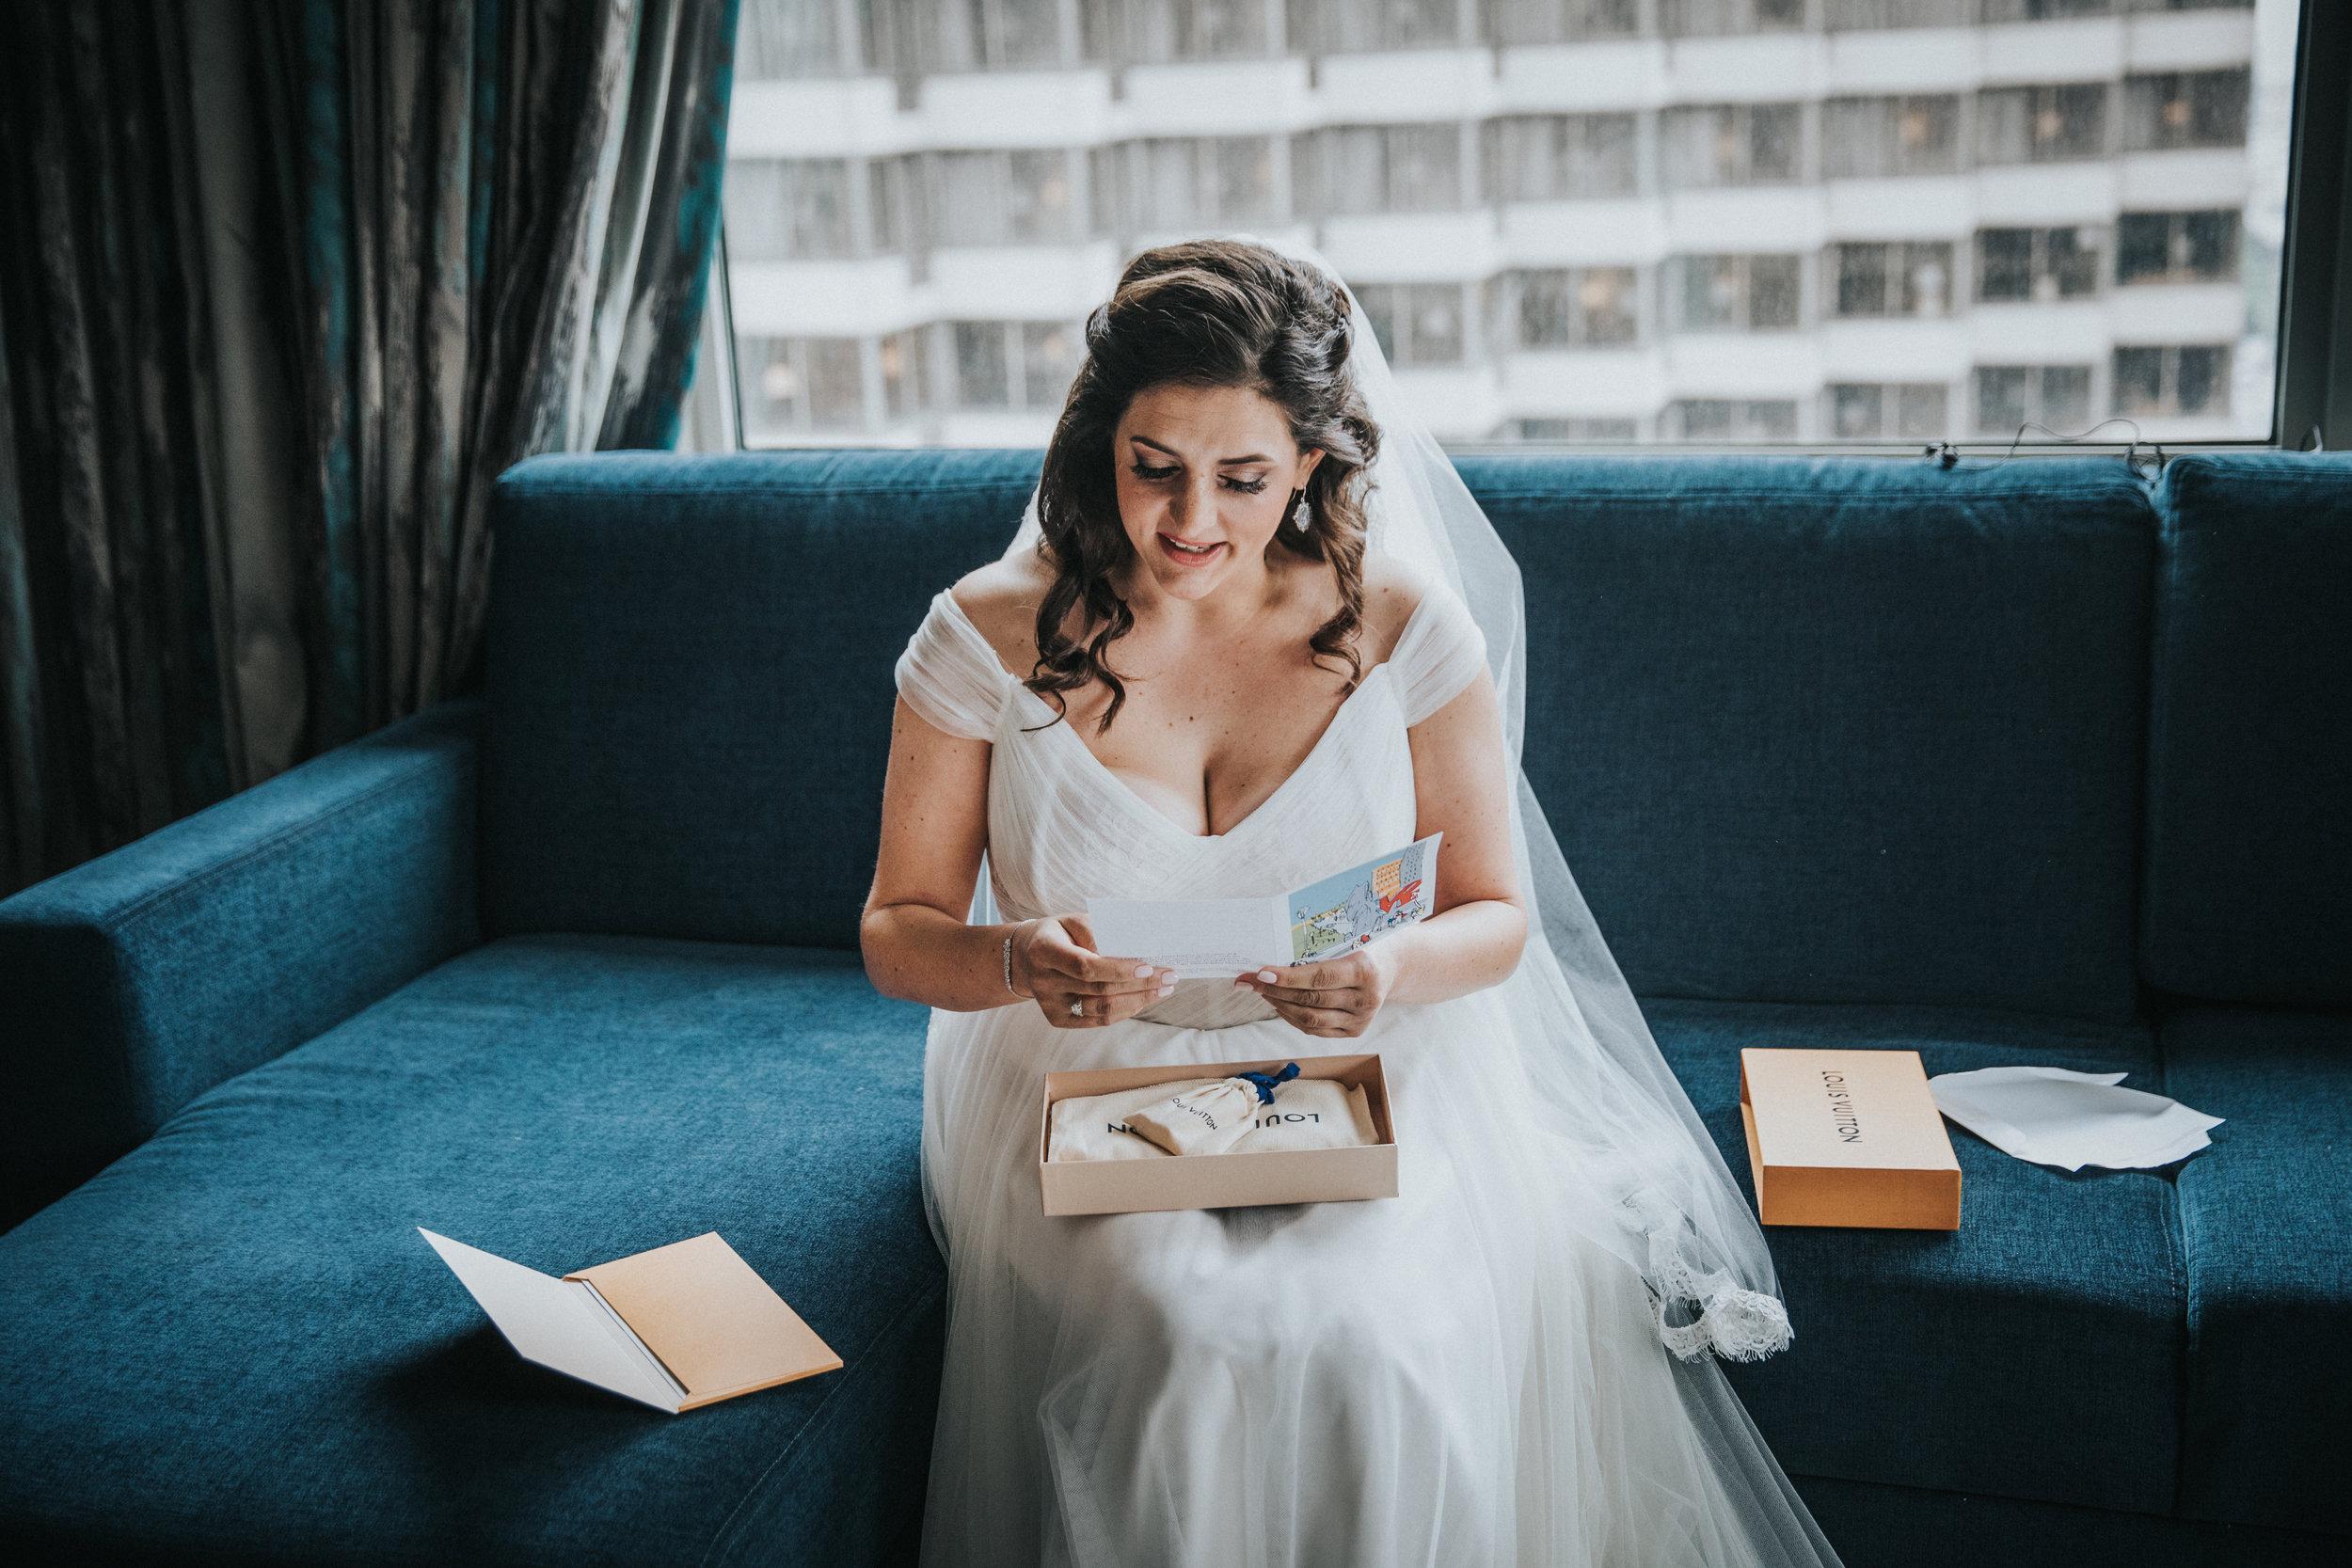 JennaLynnPhotography-NJWeddingPhotographer-Philadelphia-Wedding-ArtsBallroom-GettingReady-79.jpg